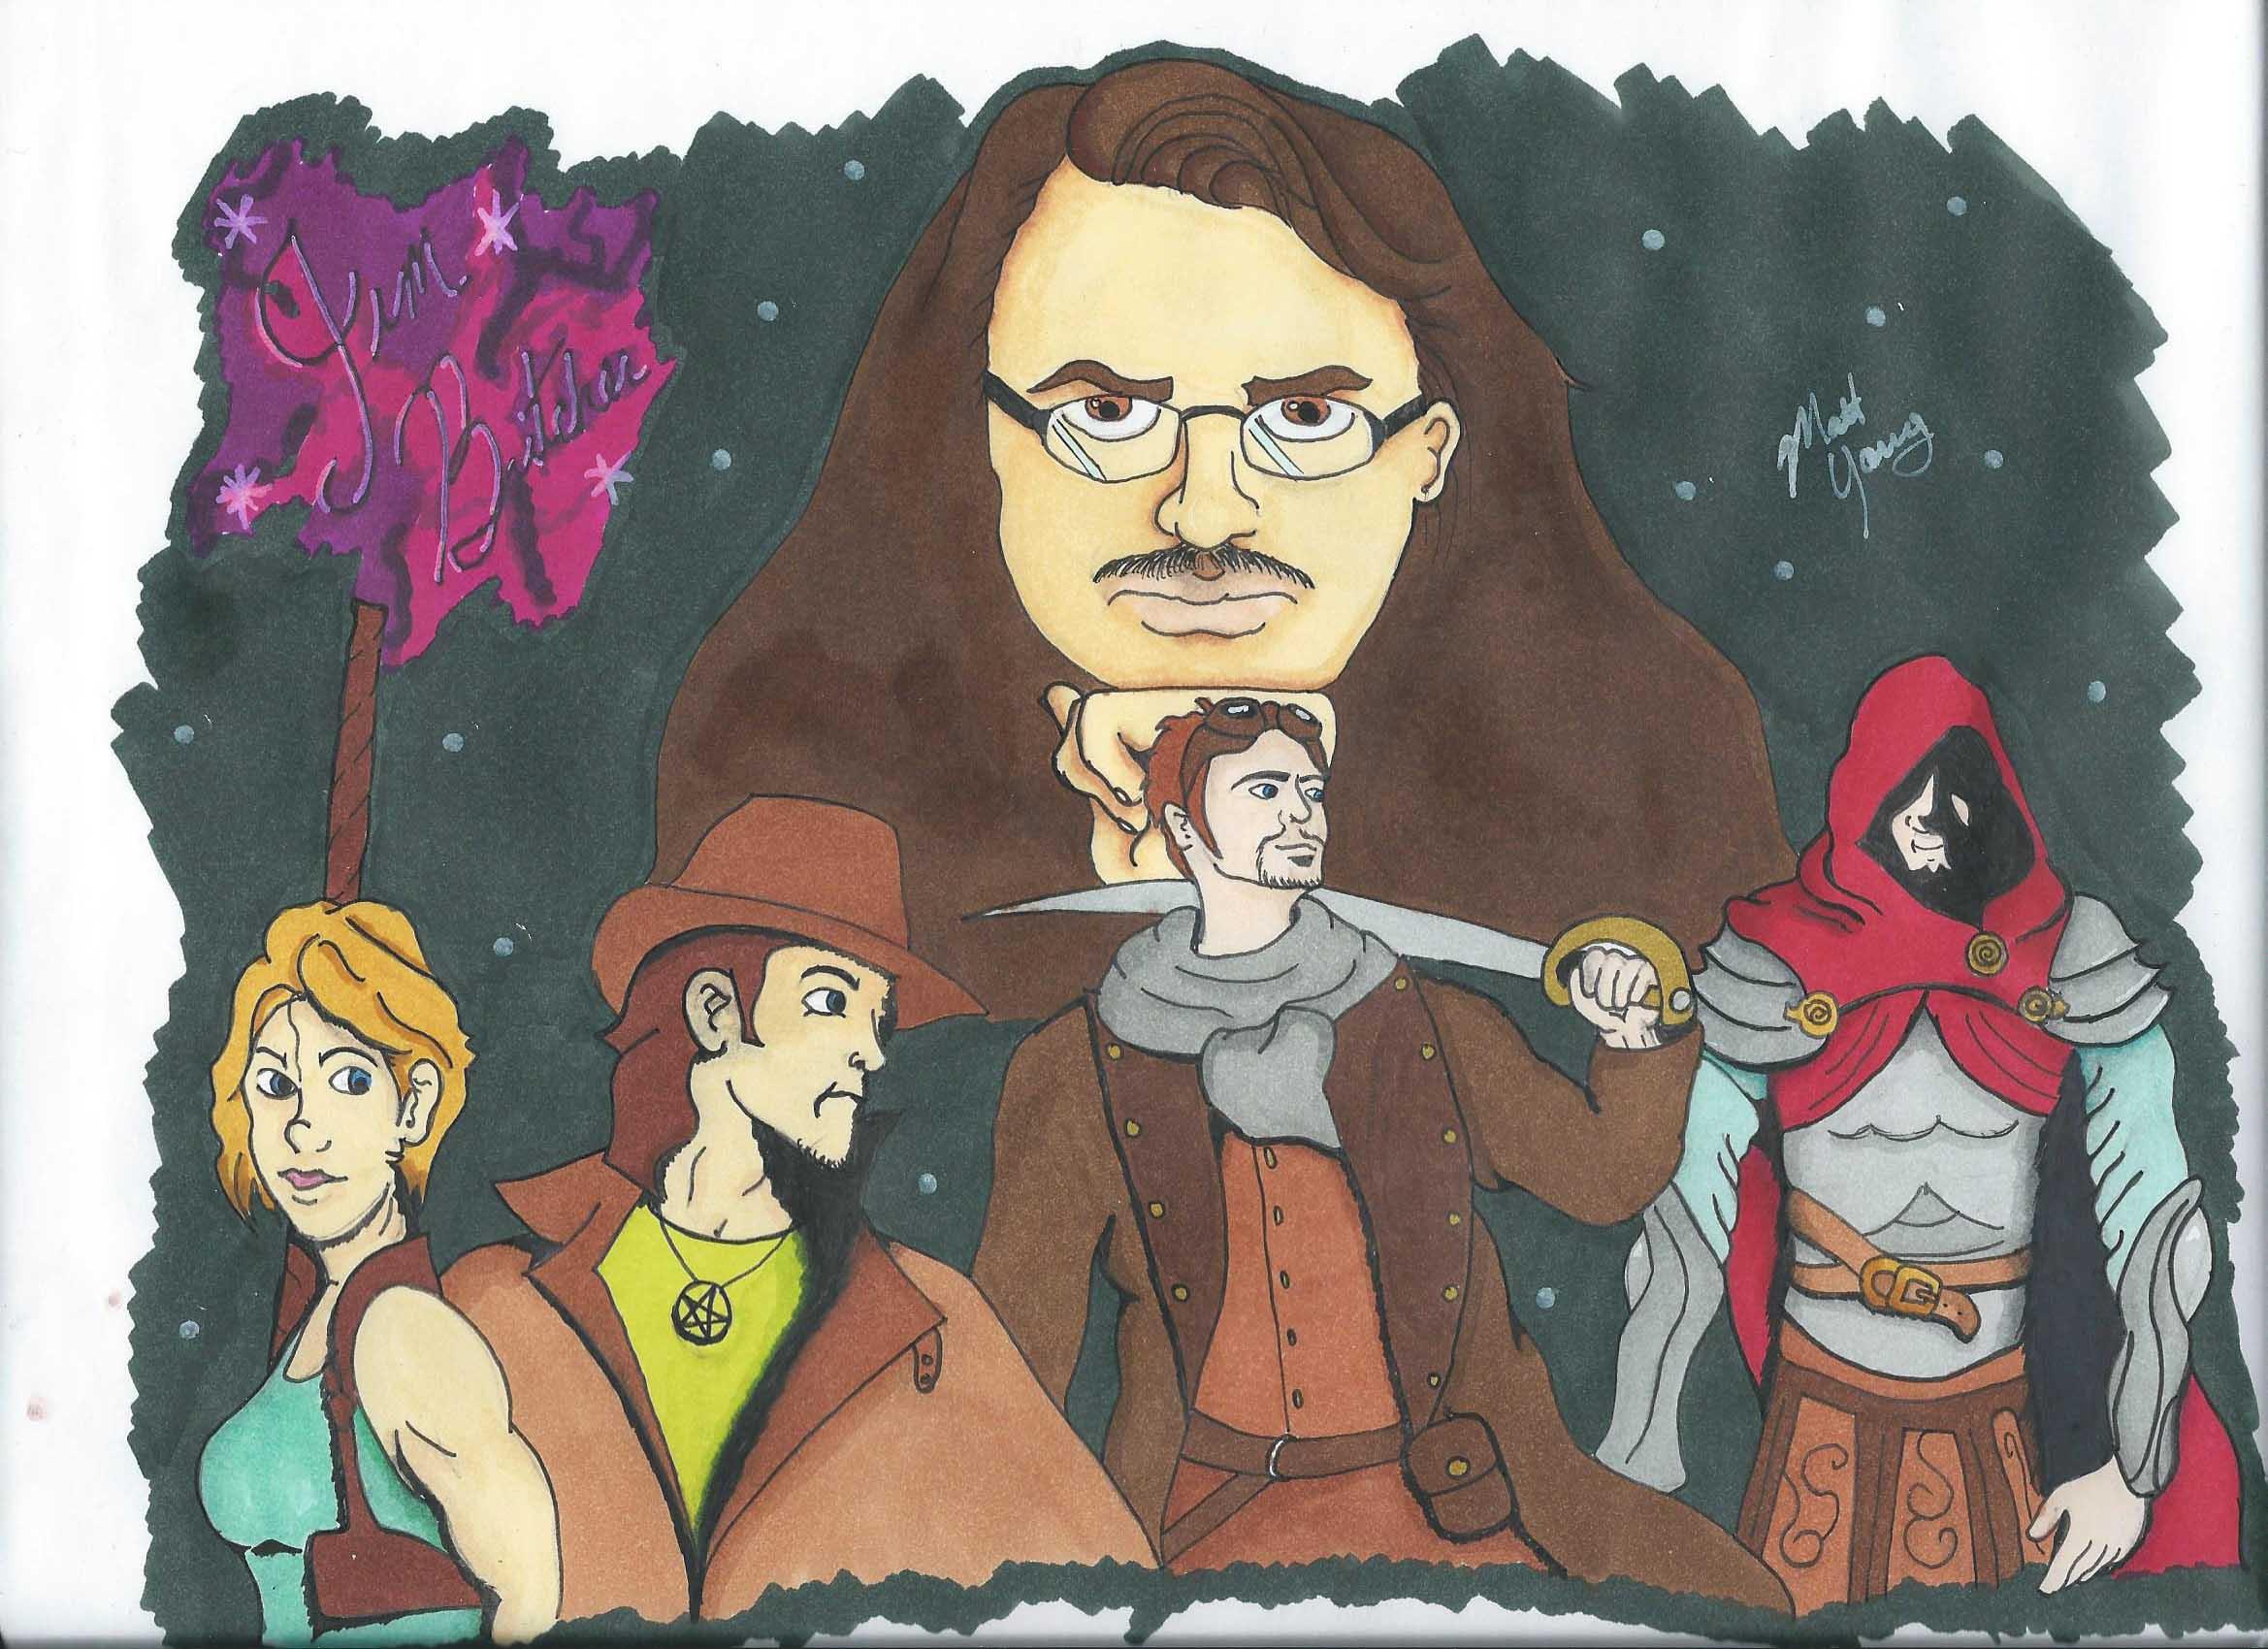 Jim Butcher - Sharing the Fantasy